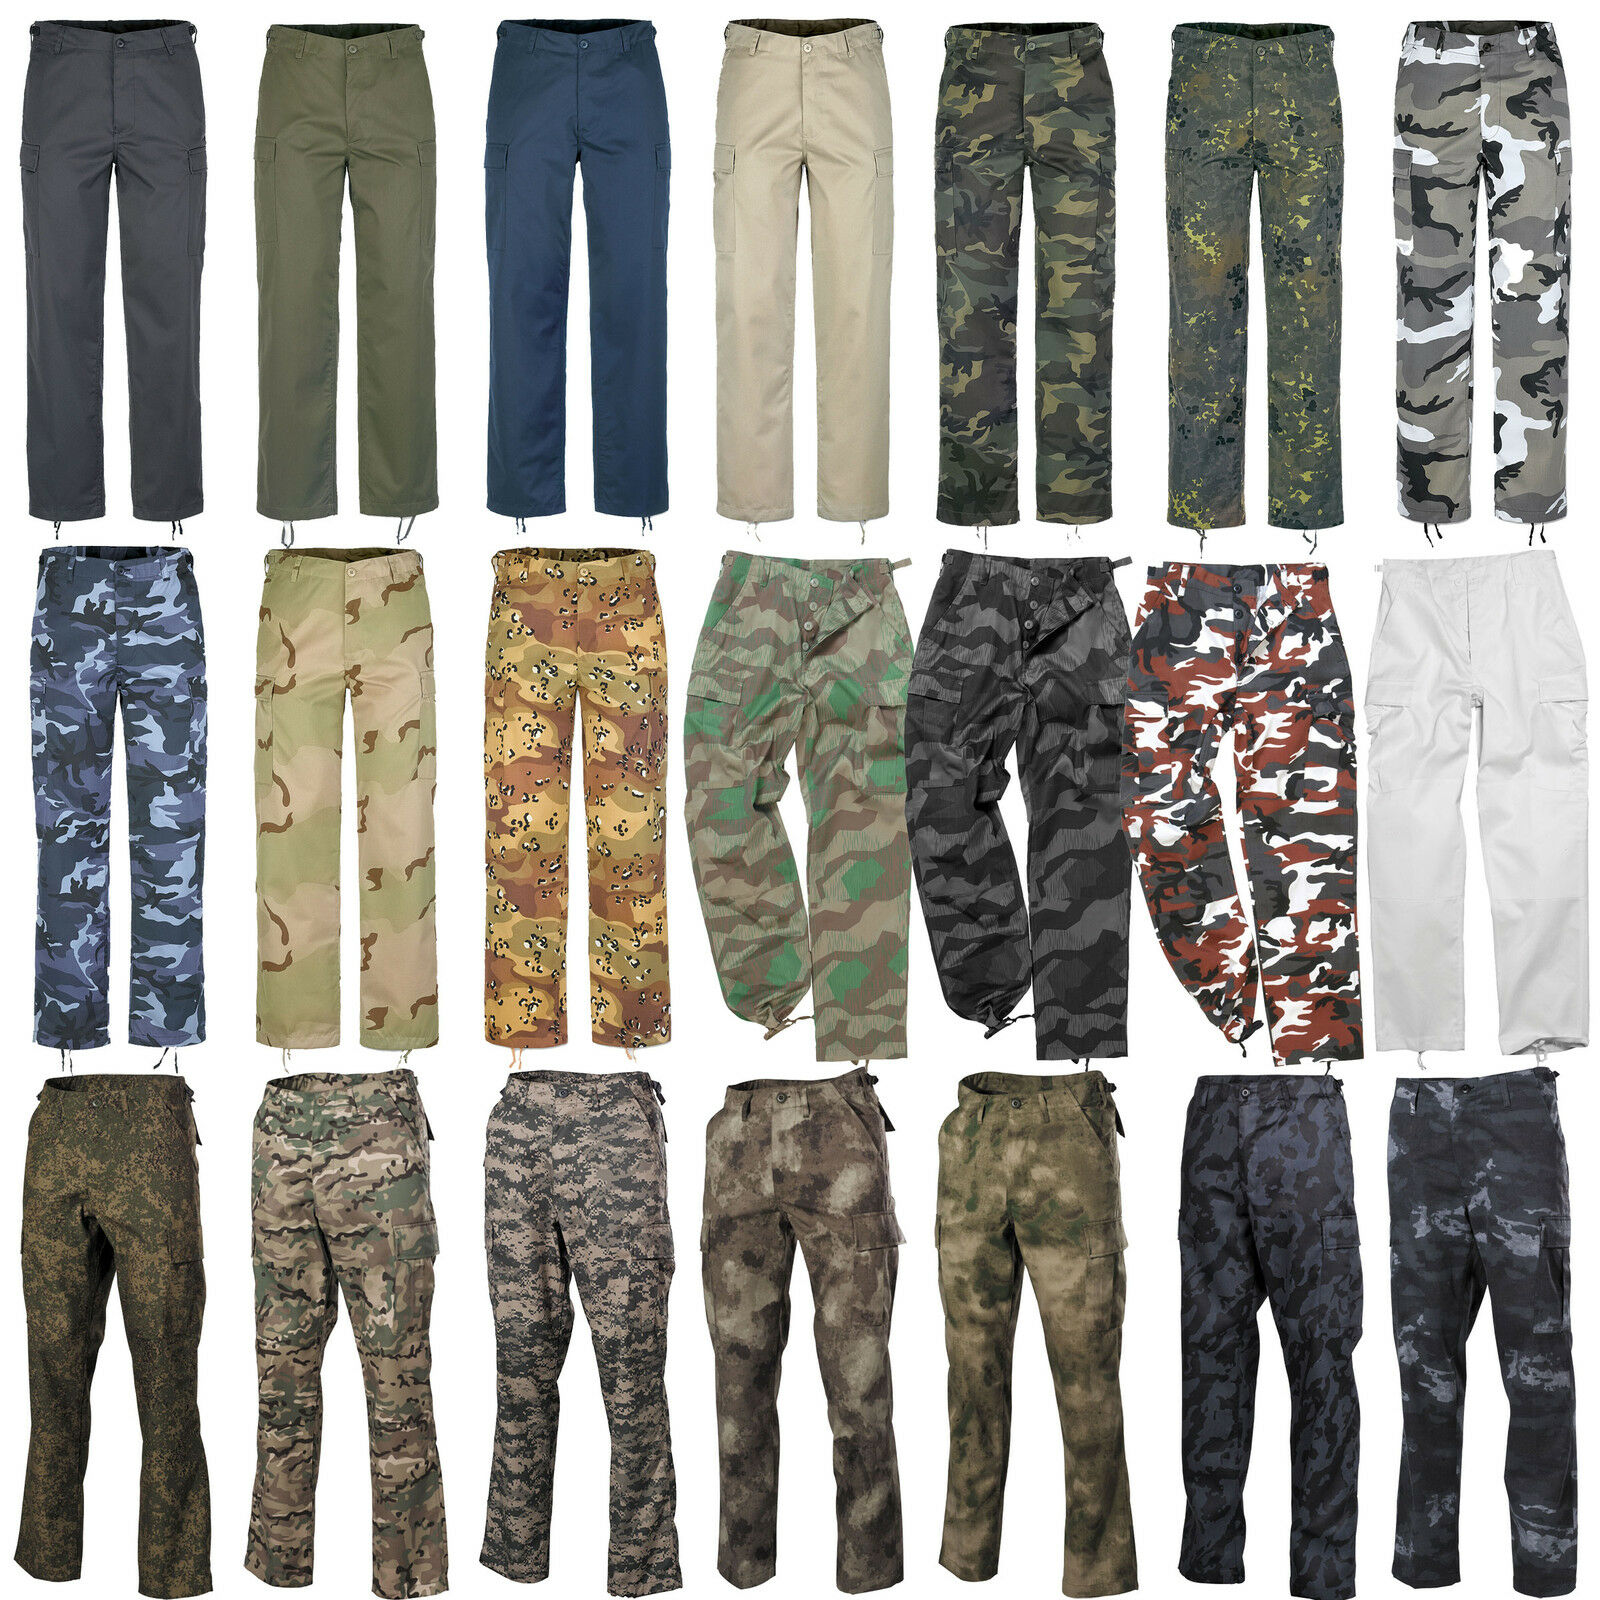 Herren Cargohose Army Cargo Militär Arbeitshosen Pants Camo Camouflage Hosen